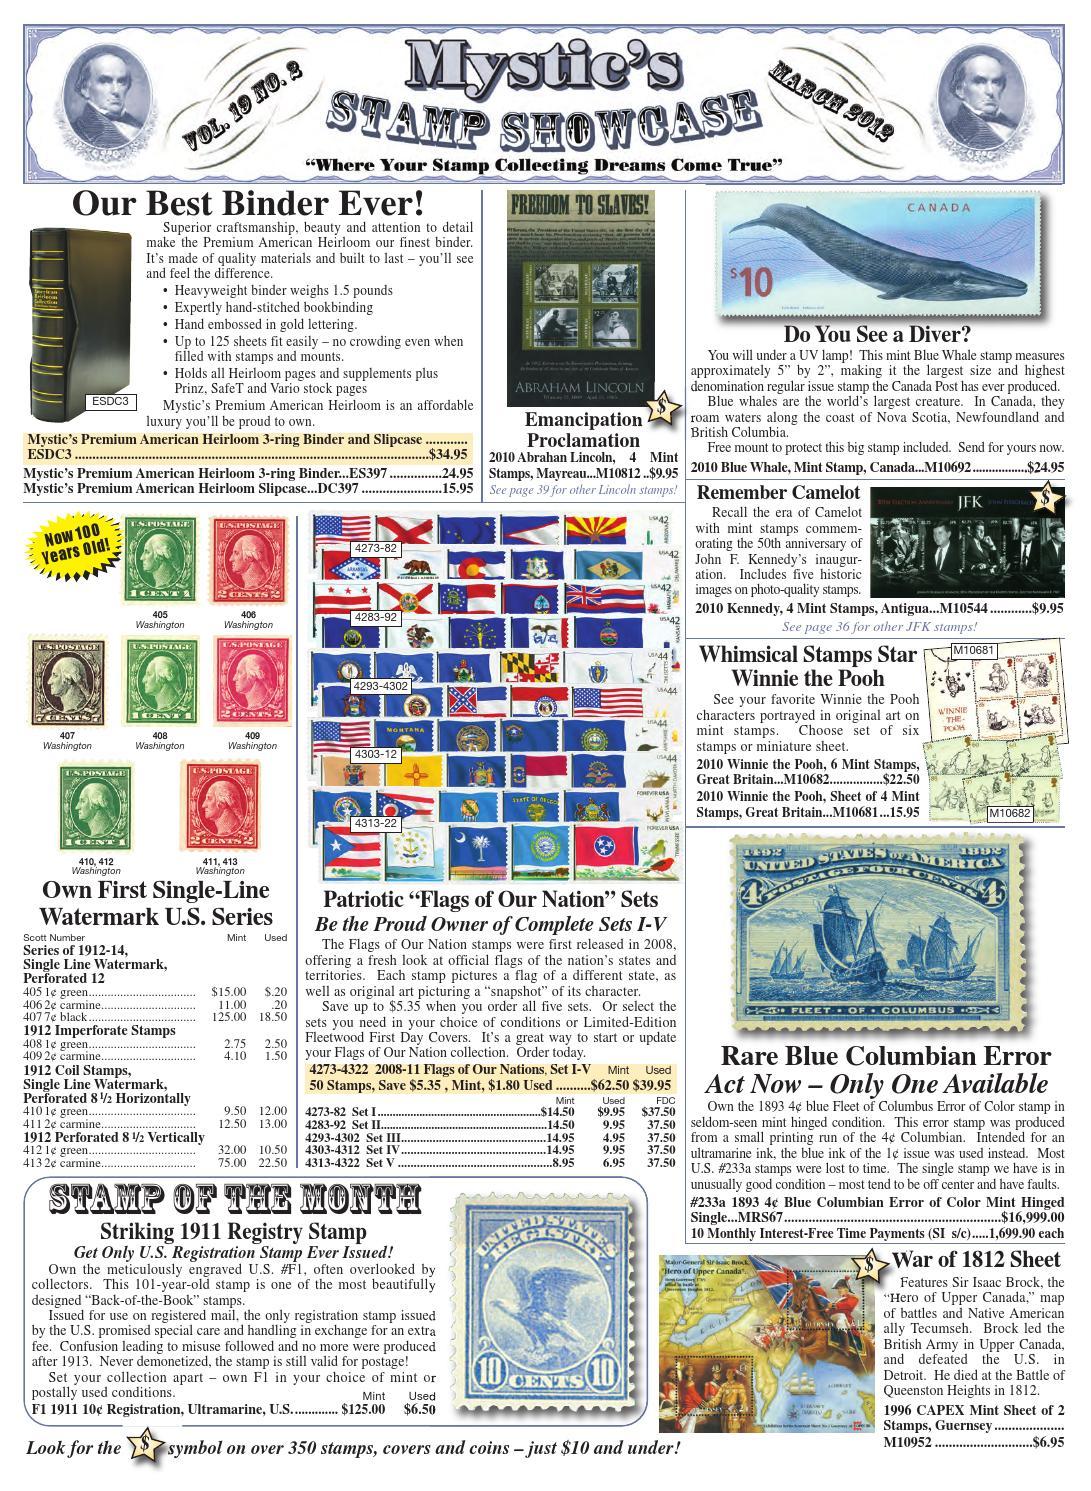 2012 March Showcasemystic Stamp Company – Issuu Inside North Penn School District Calendar 2021 20